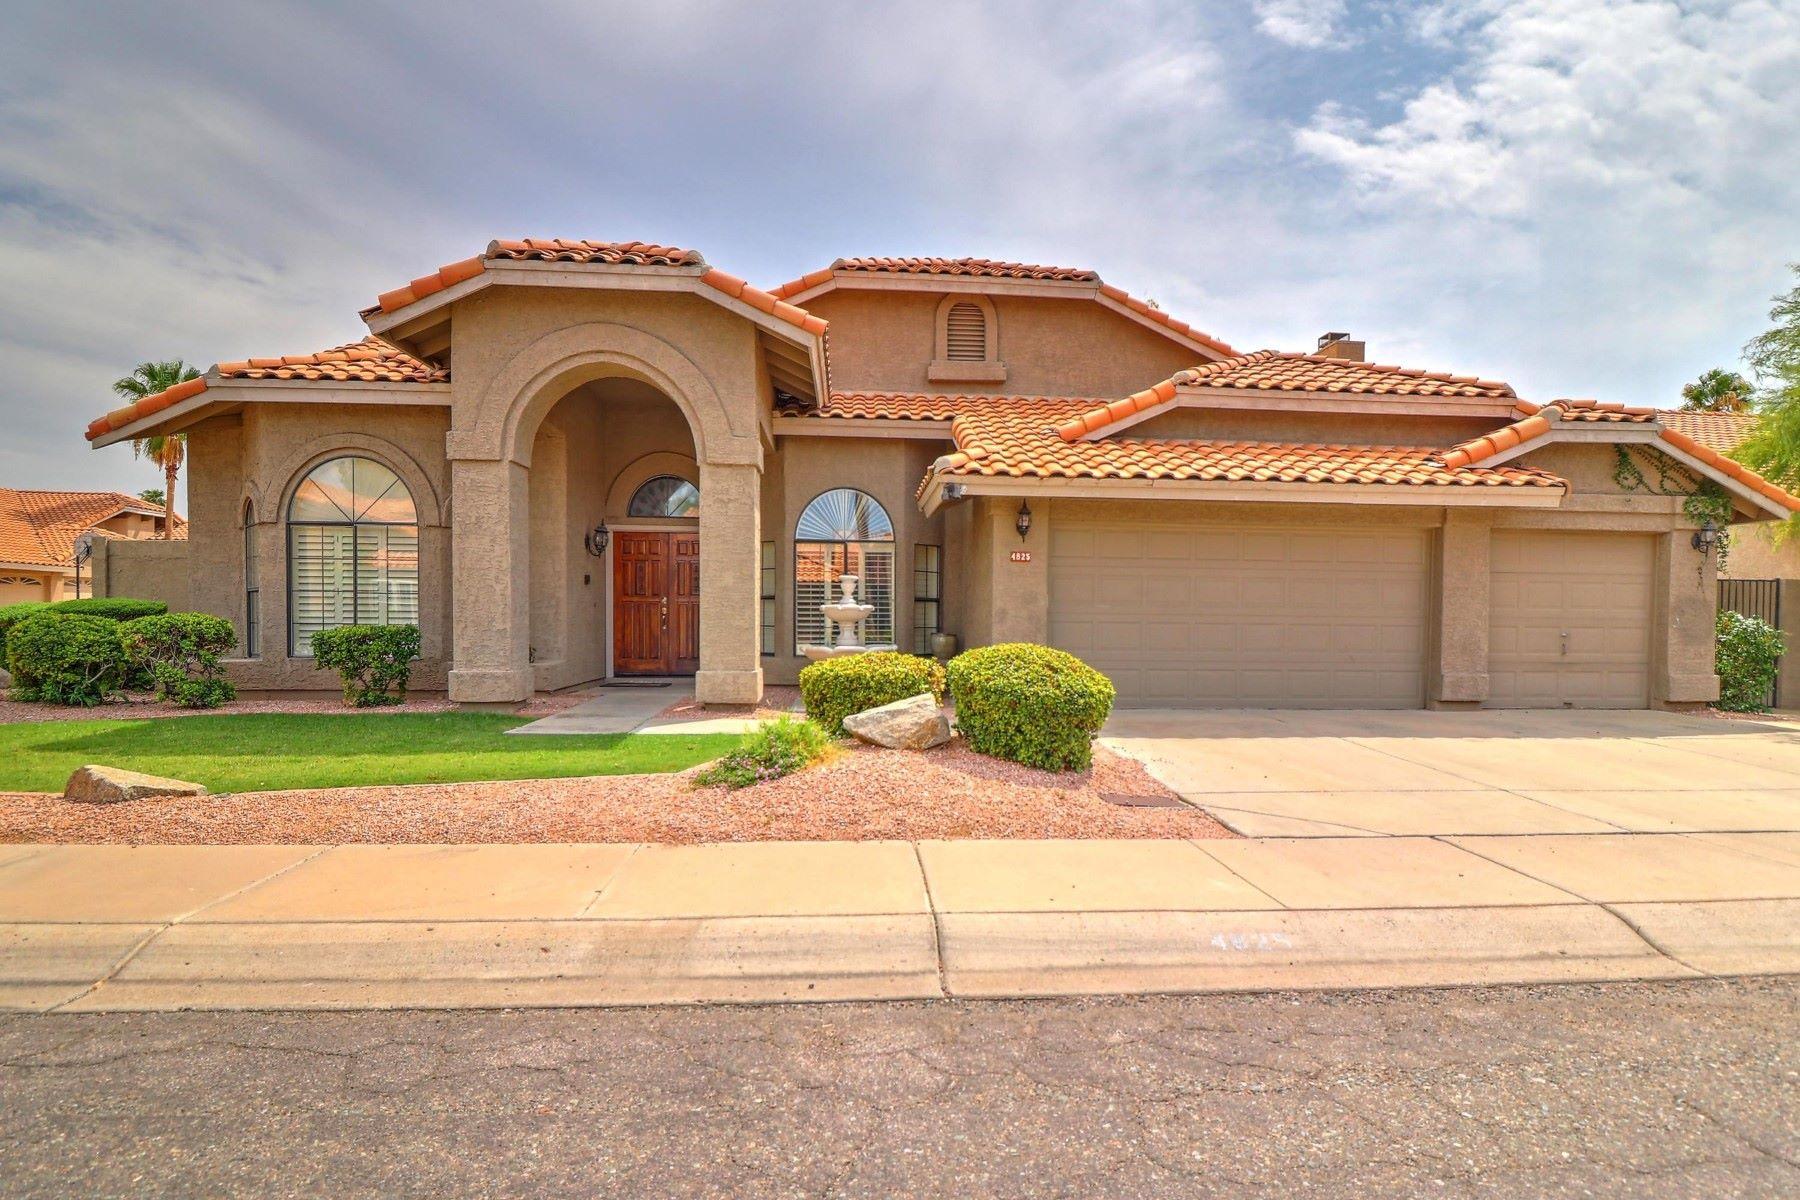 Частный односемейный дом для того Продажа на Lovely Single Story Paradise Valley Home 4825 E Aire Libre Ave, Scottsdale, Аризона, 85254 Соединенные Штаты